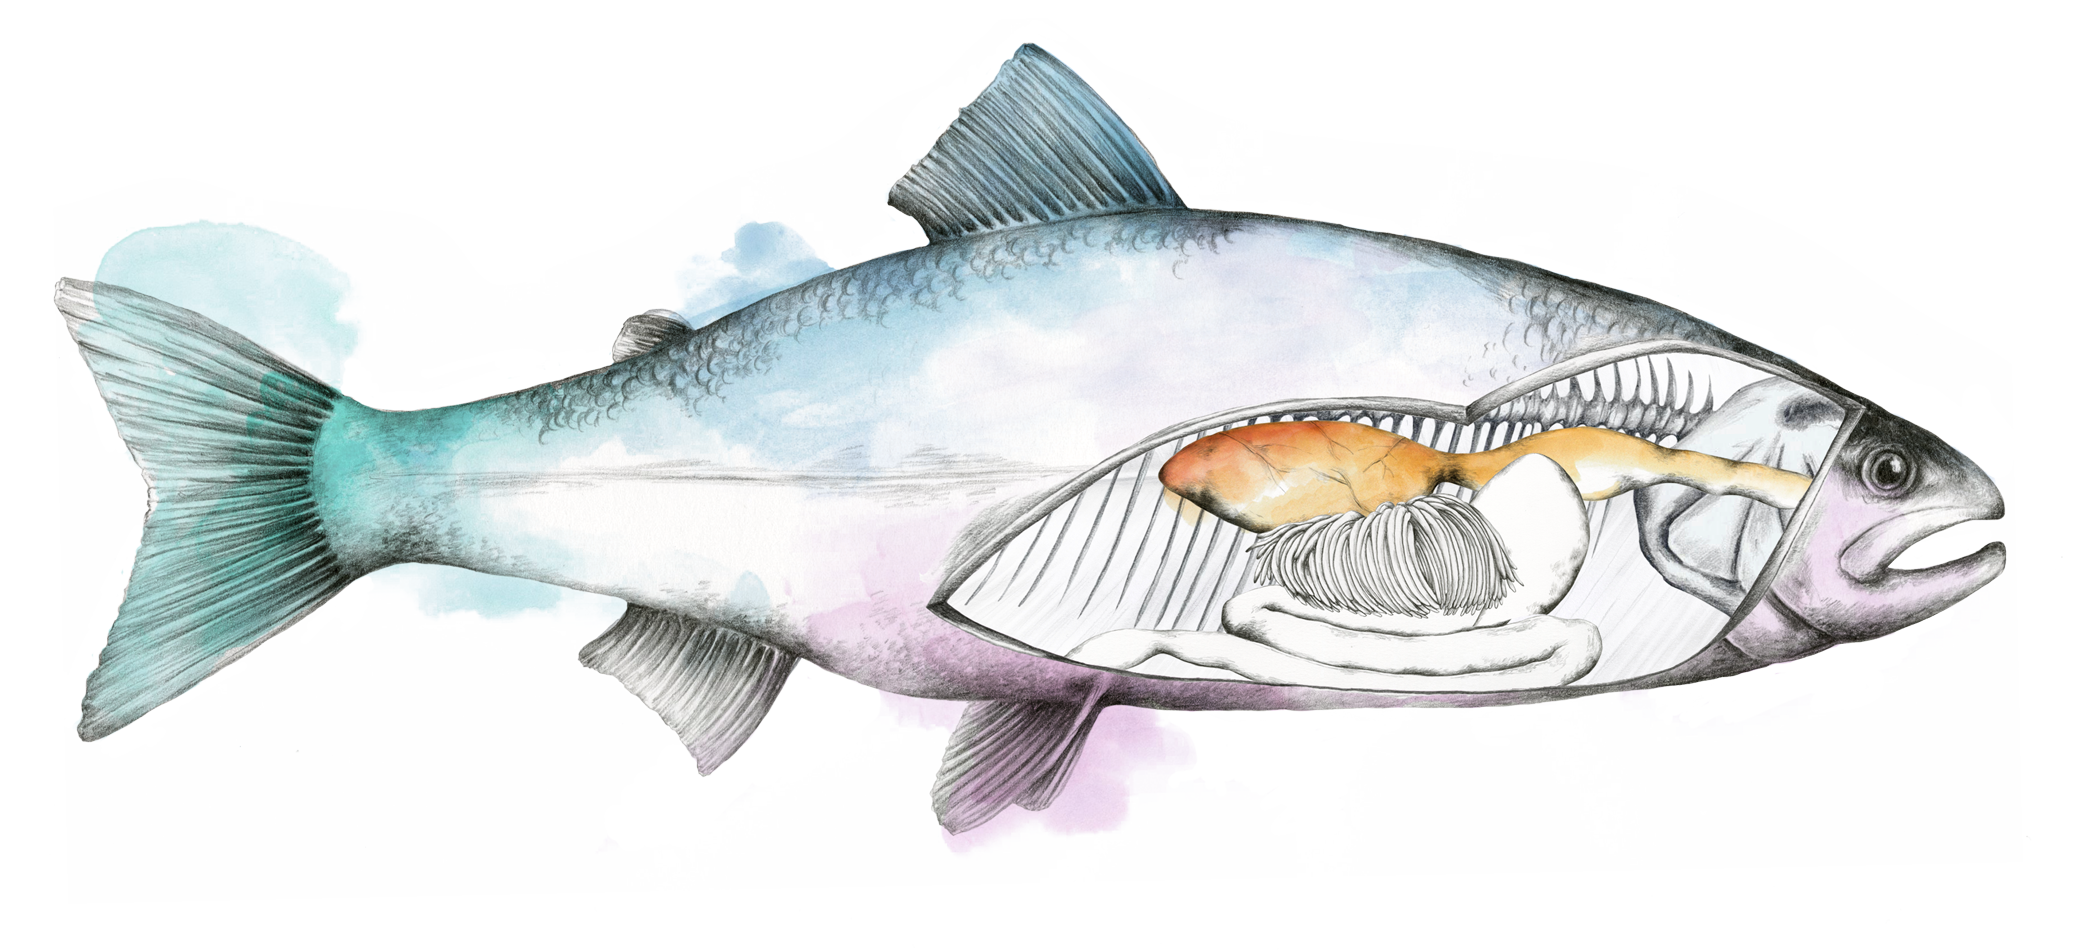 Skretting home . Xray clipart fish